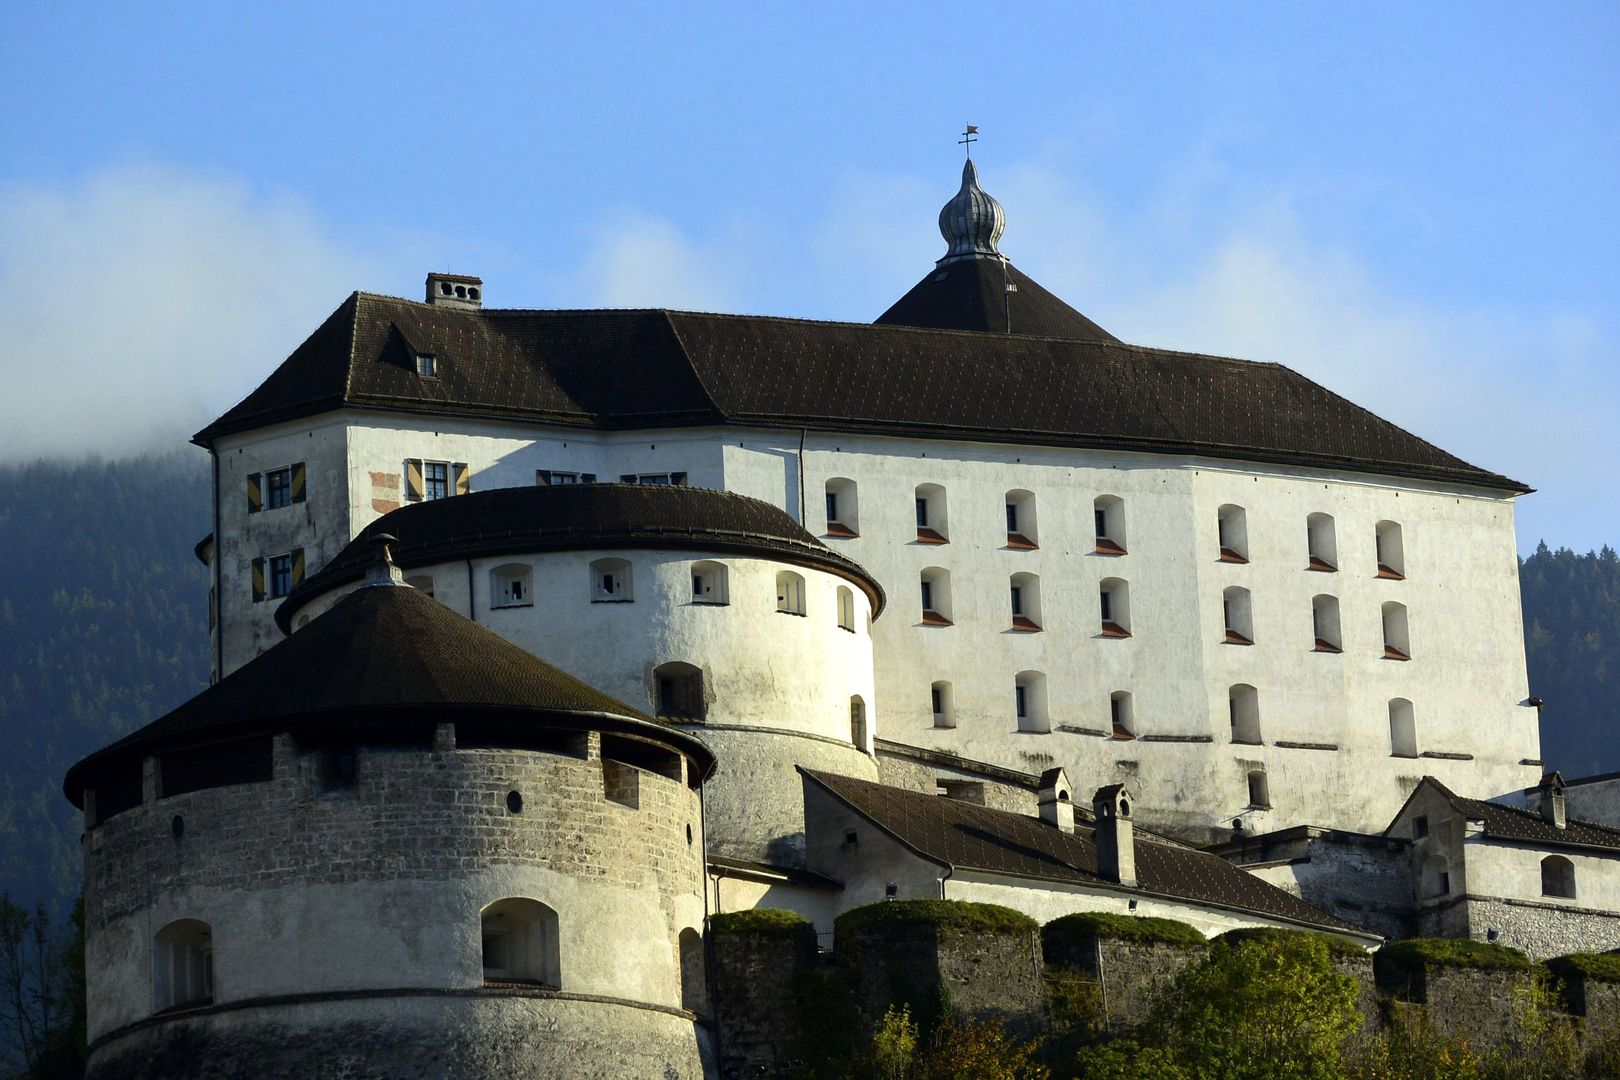 Nikon 1 V2 - 65mm Festung Kufstein